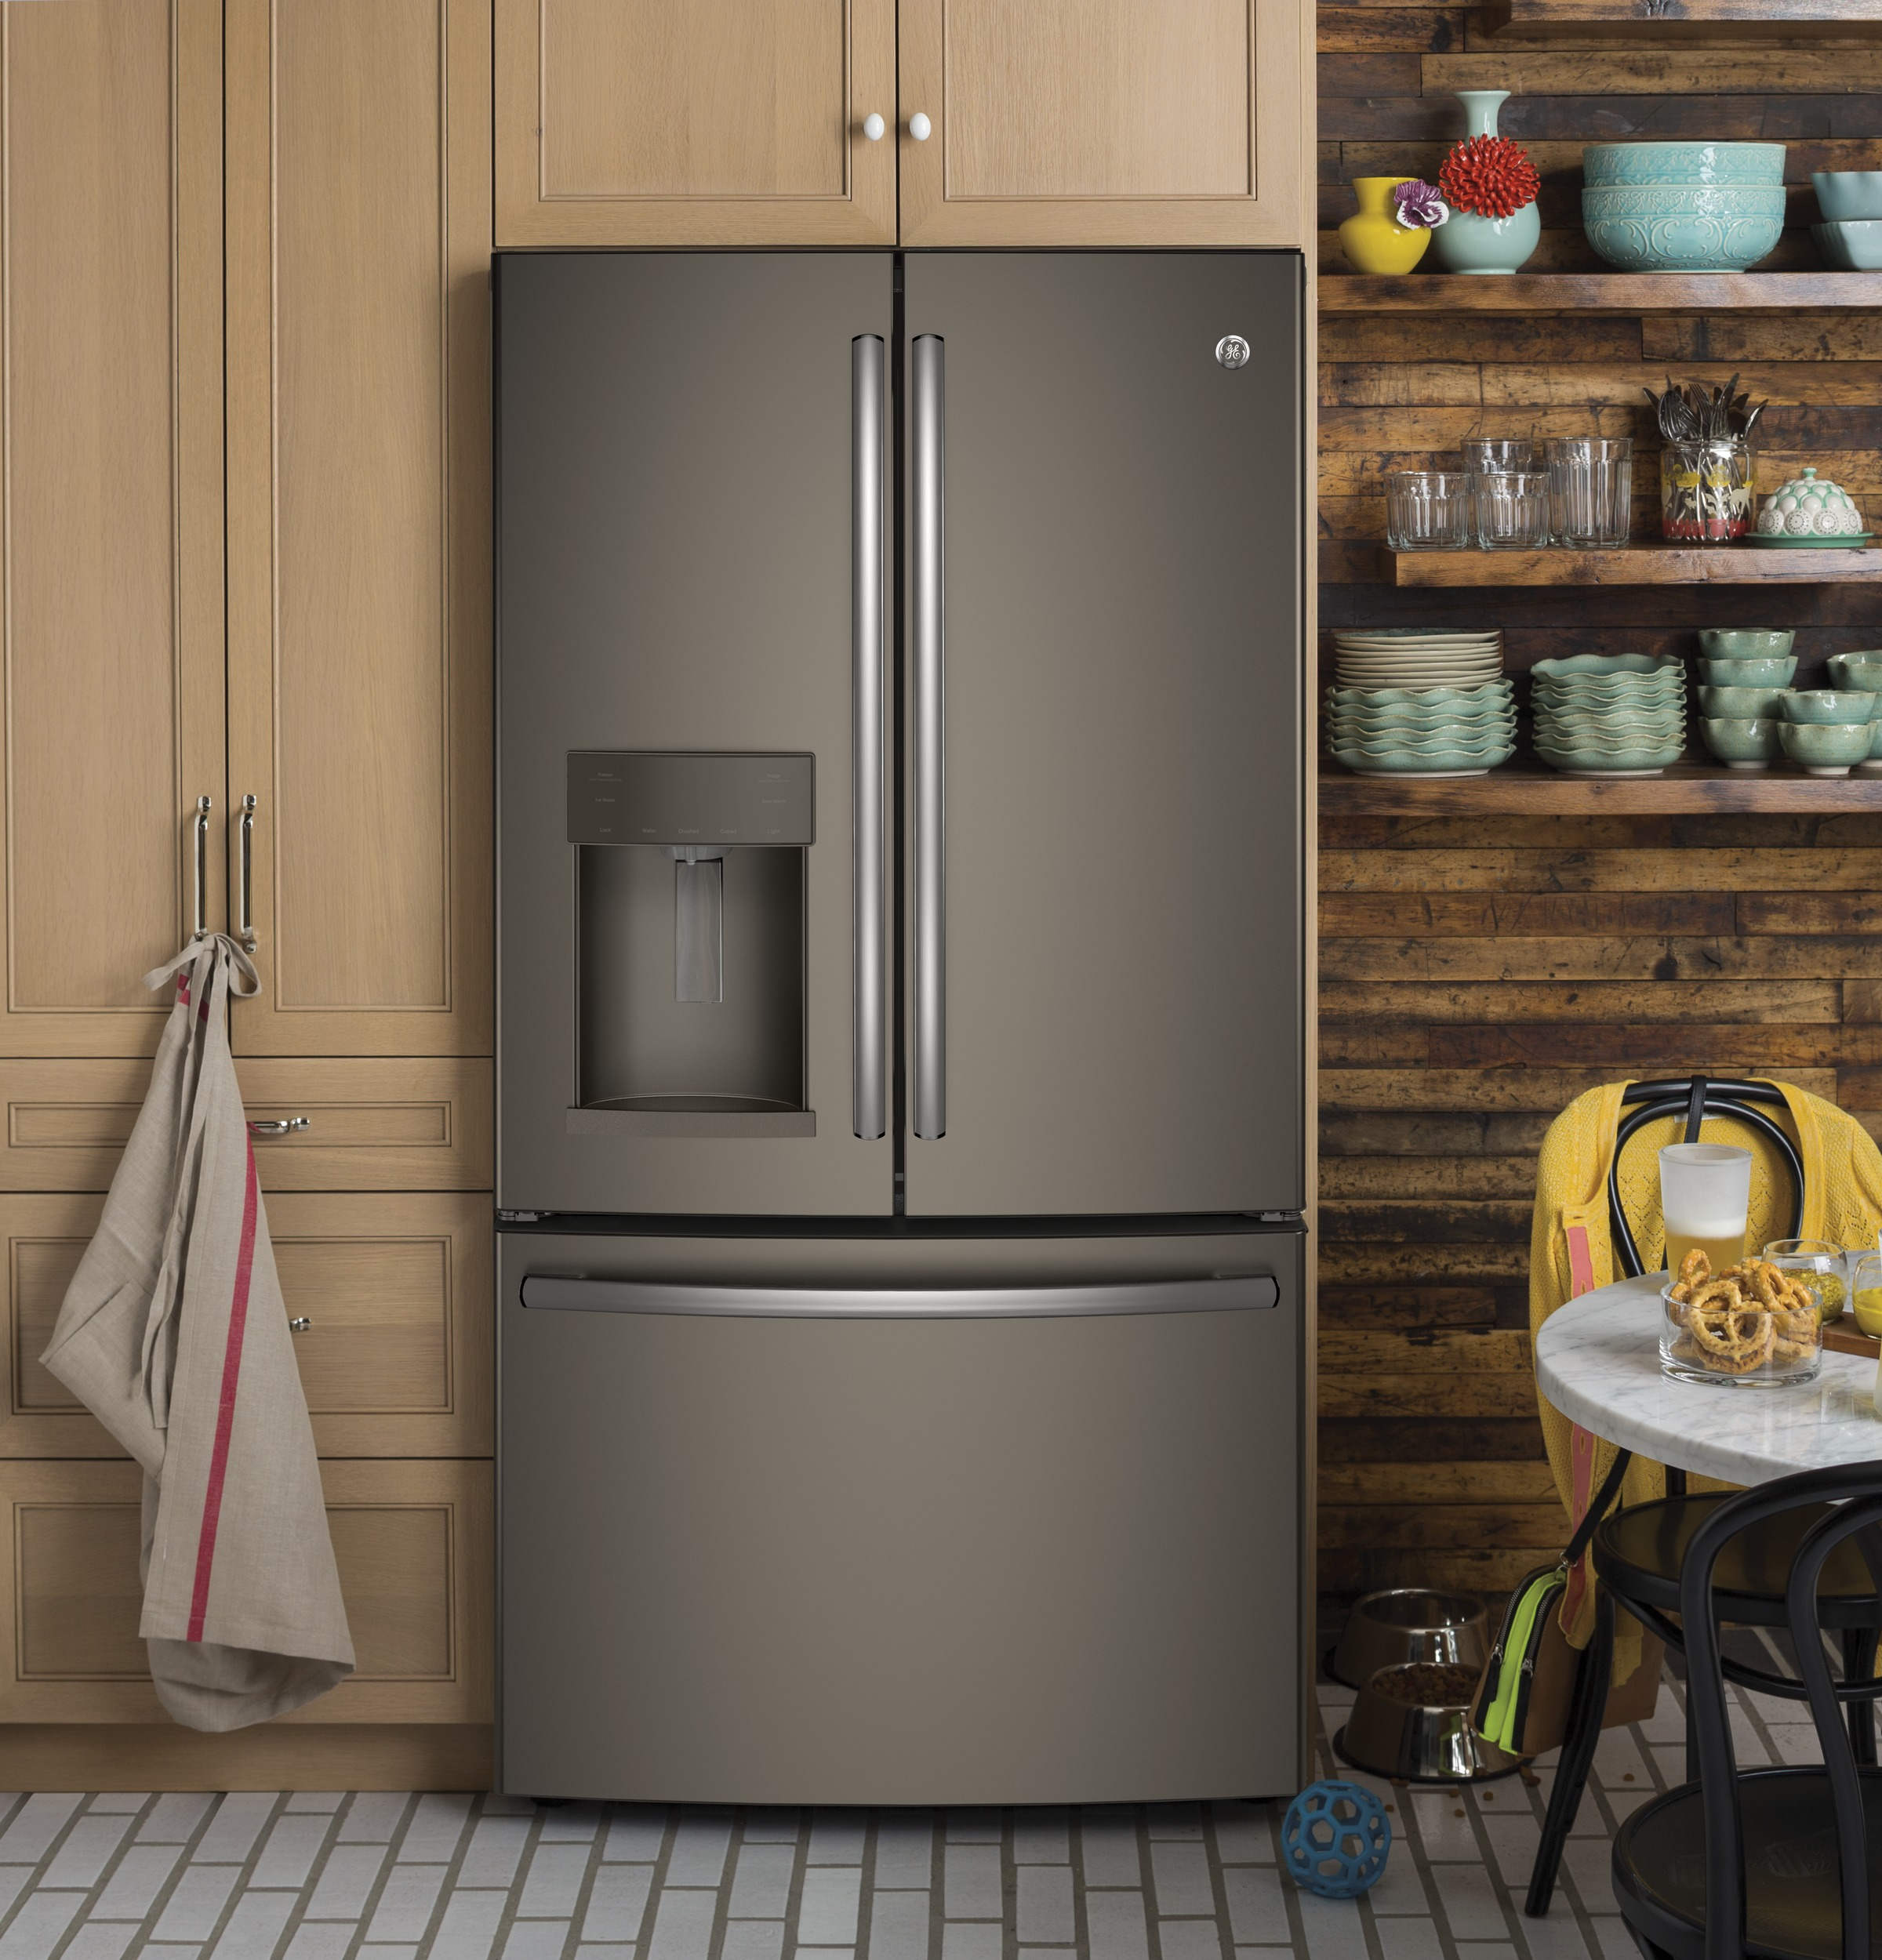 Model: GFE28GMKES | GE GE® ENERGY STAR® 27.8 Cu. Ft. French-Door Refrigerator